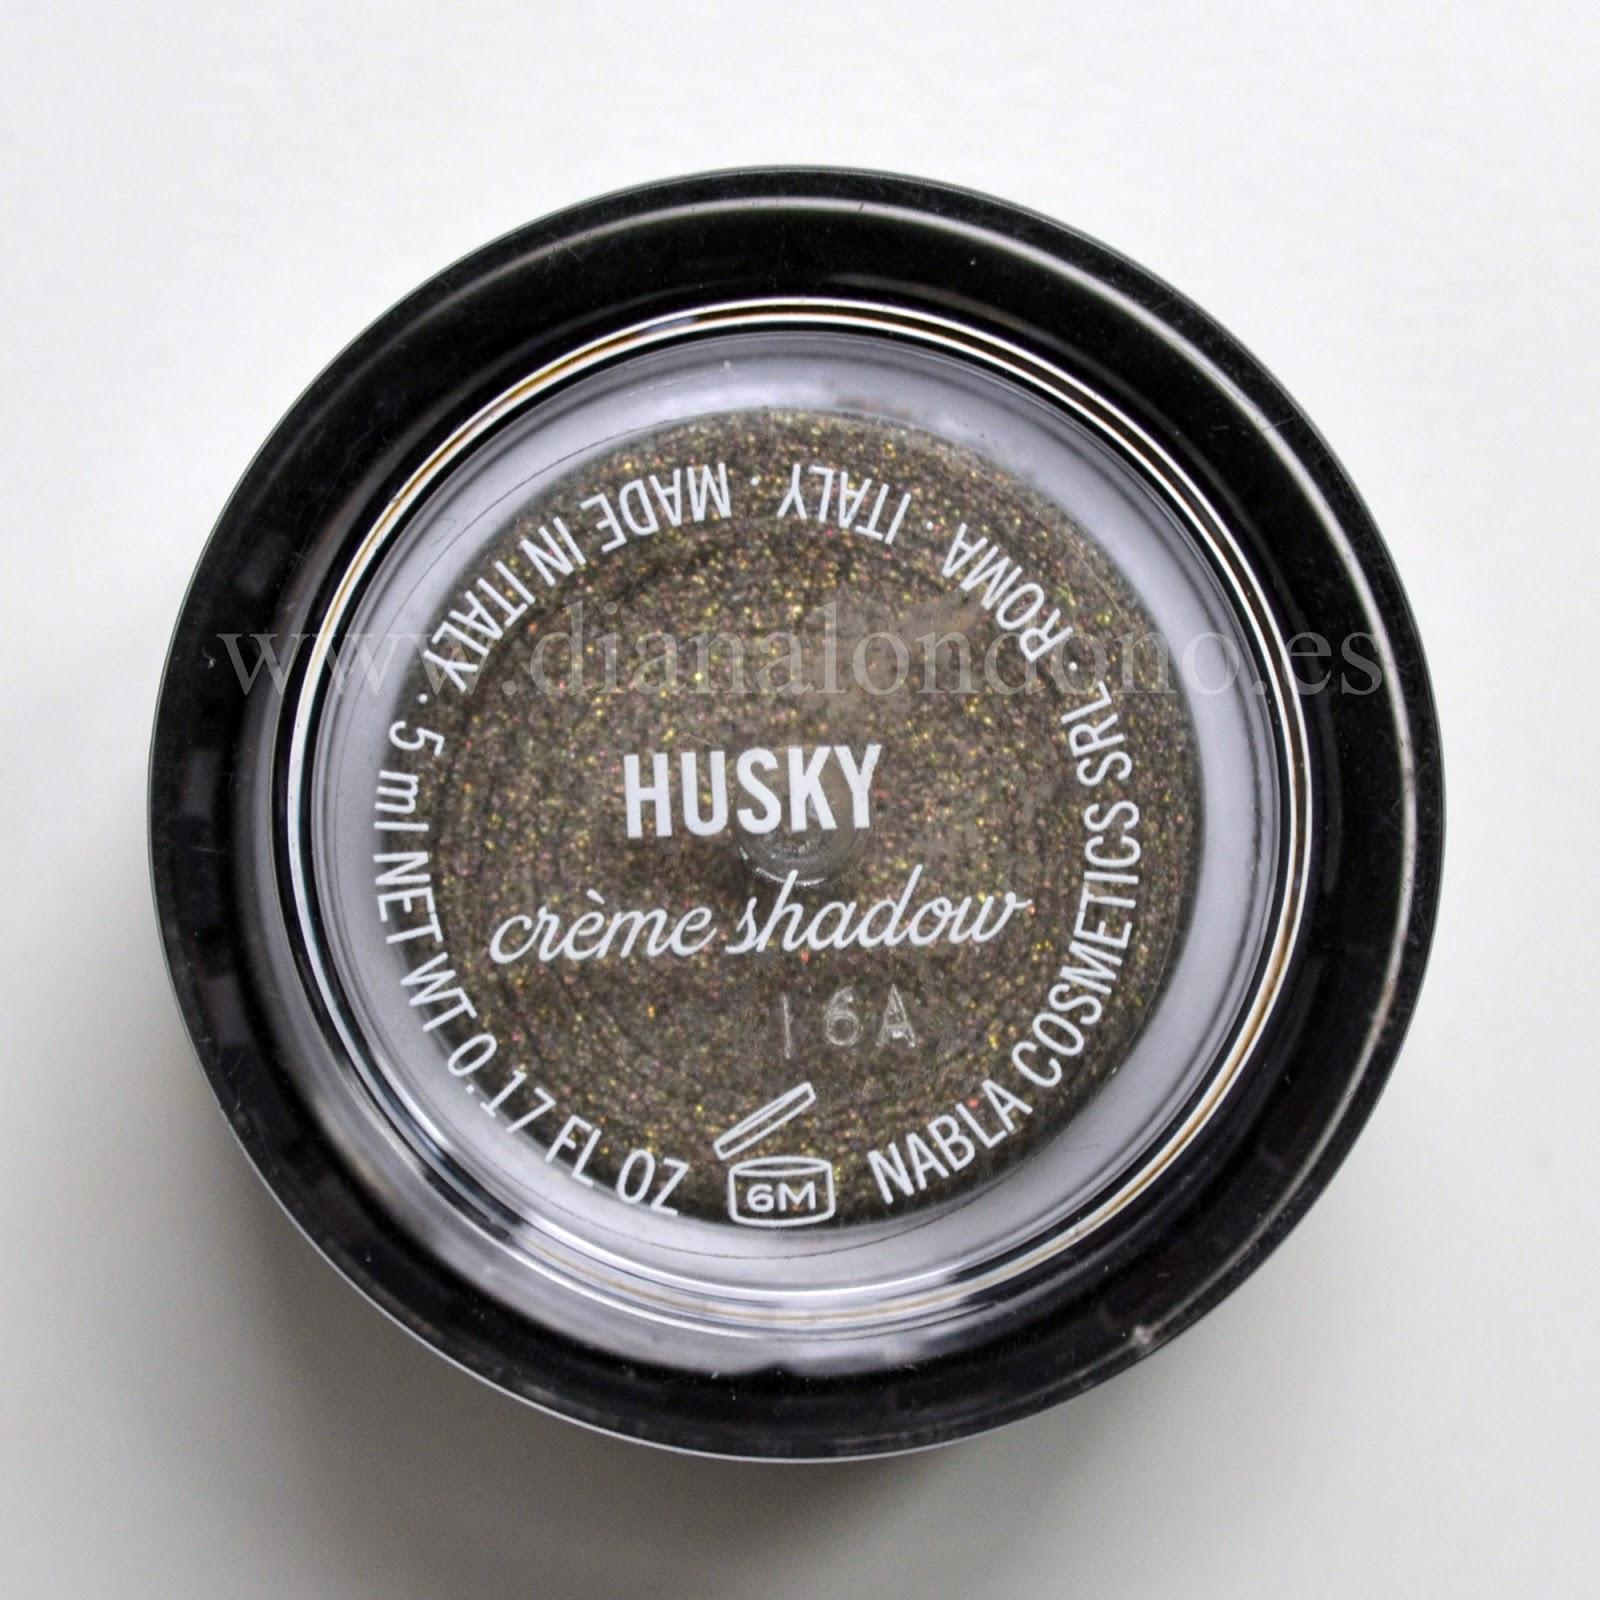 Vista trasera sombra en crema tono husky Nabla cosmetcis